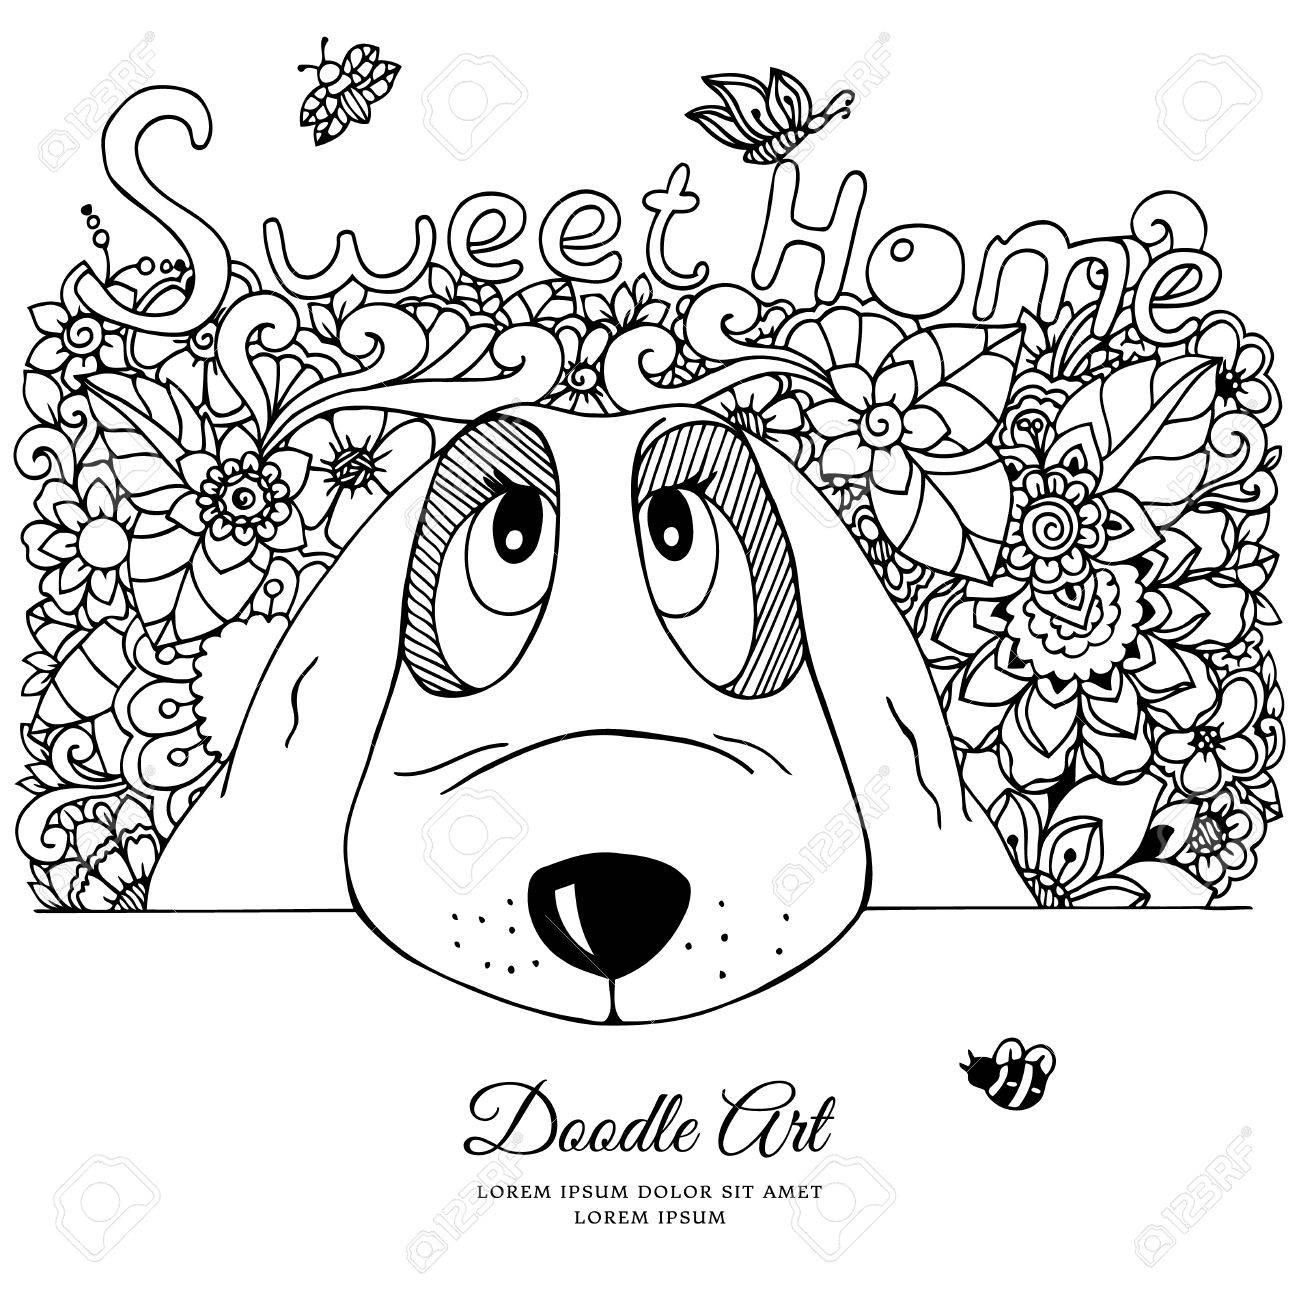 Vector Illustration Dog And Flowers Doodle Drawing Meditative